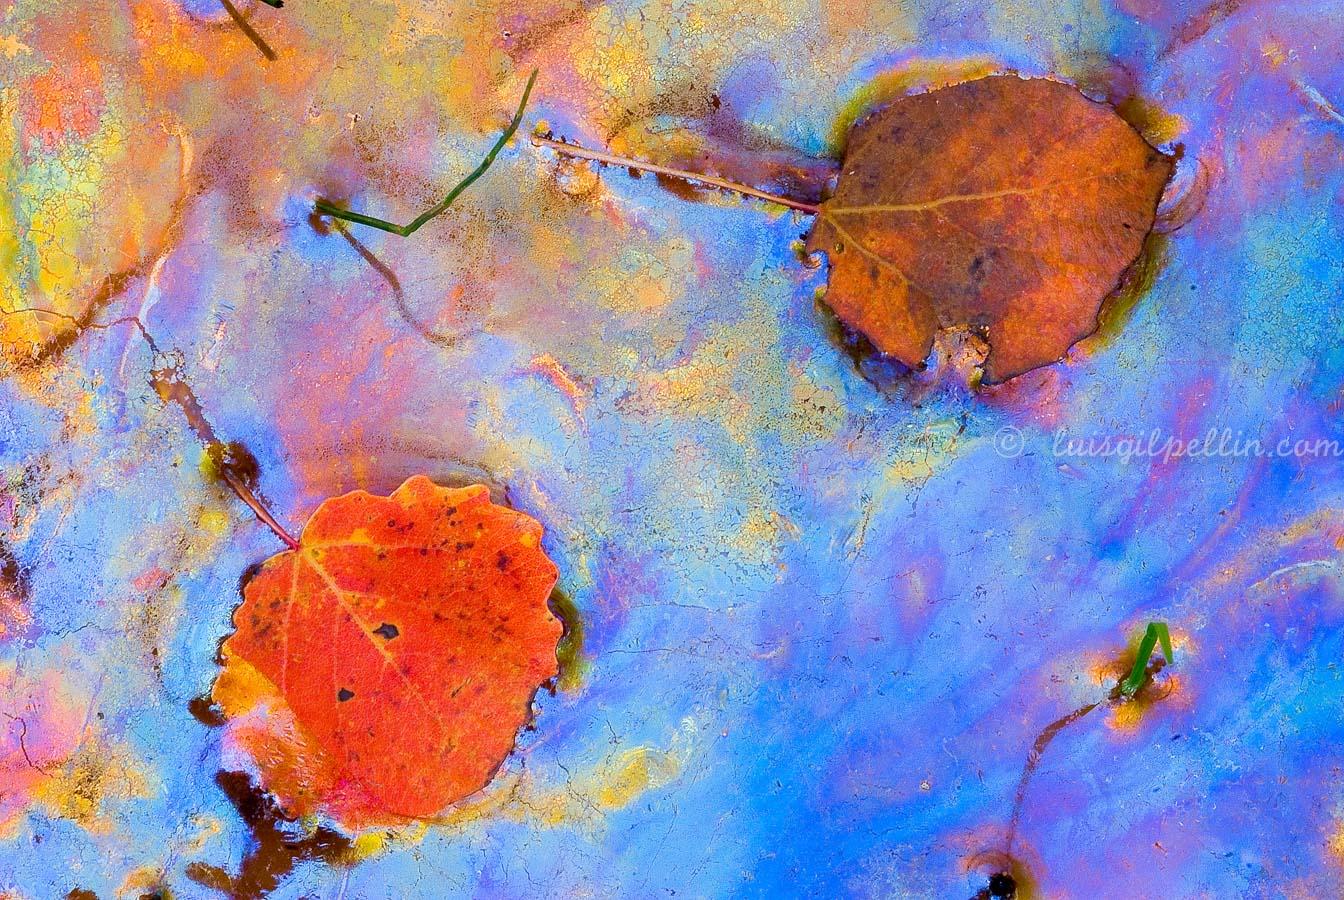 Aguas de otoño - Ultimas imagenes - Luis Antonio Gil  Pellín , Fotografia de naturaleza